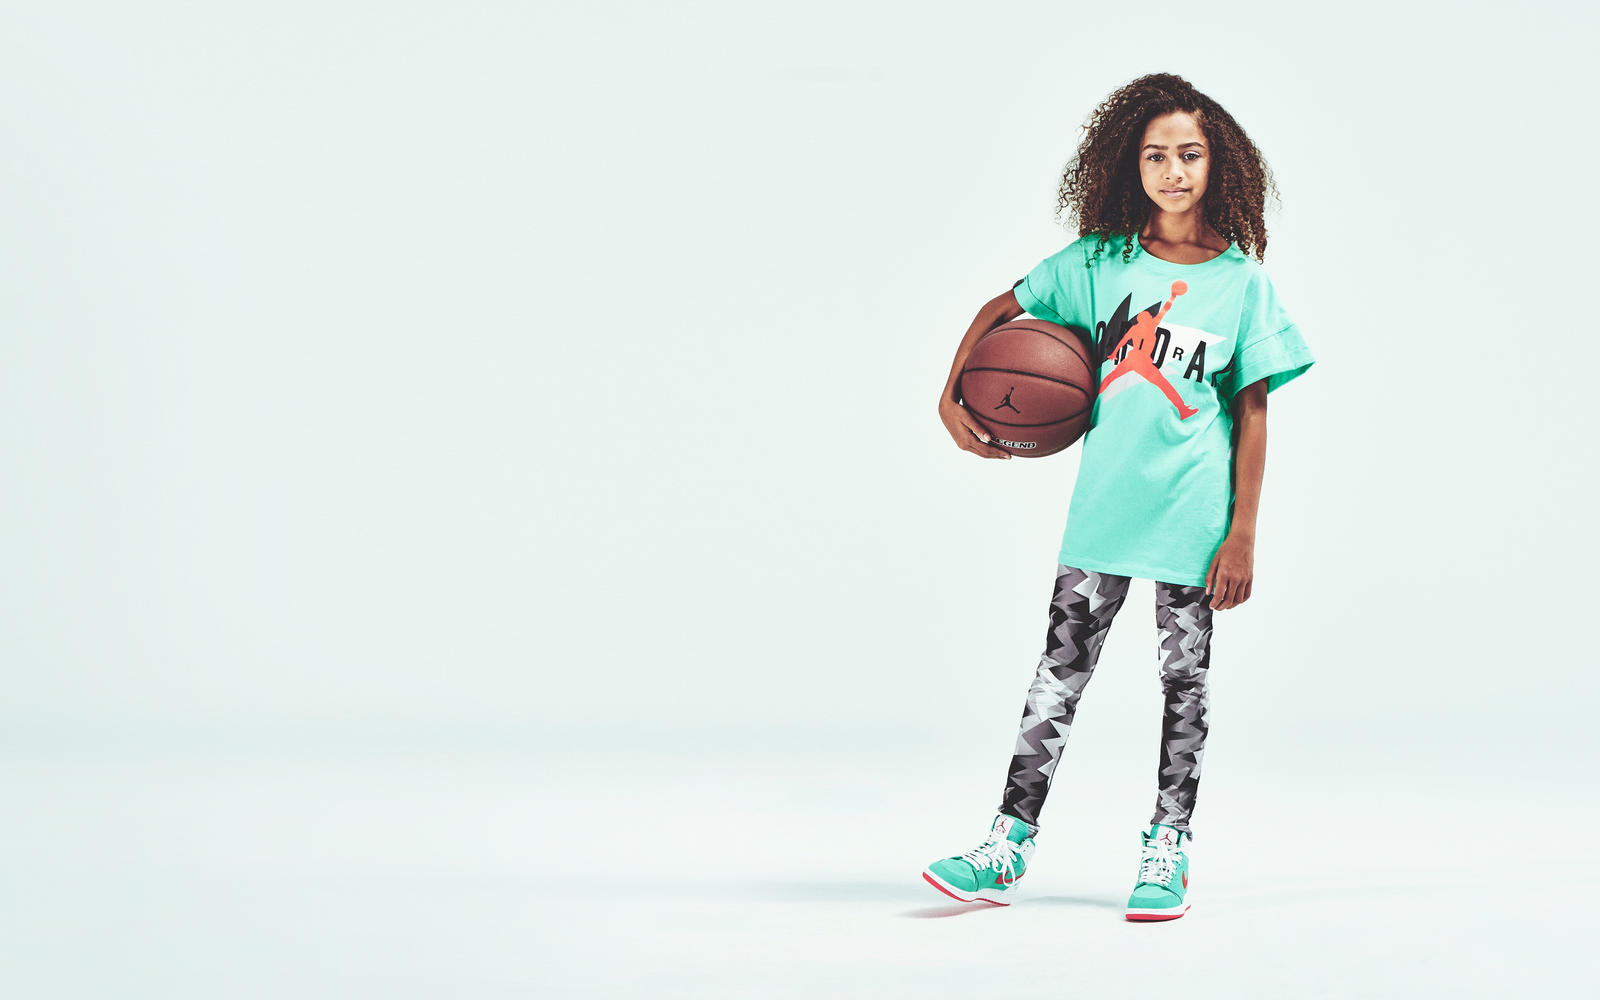 Nike News - Jordan Brand expands Grade School sizing for girls